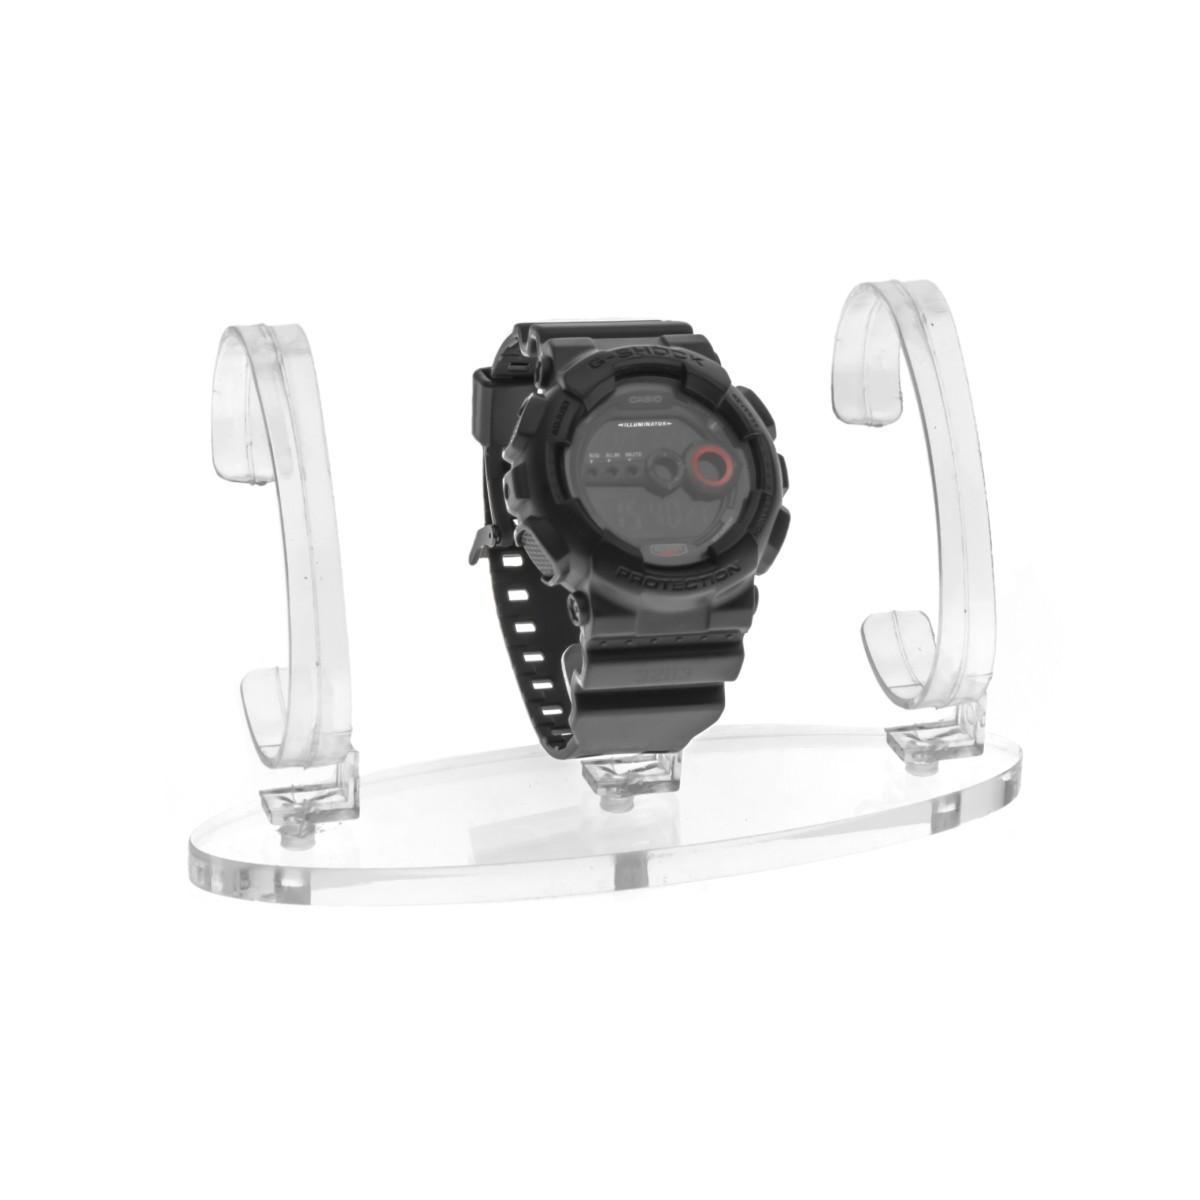 E-165 EPO-C - Portaorologi in plexiglass trasparente a 3 postazioni - Misure: 16x5x H10 cm